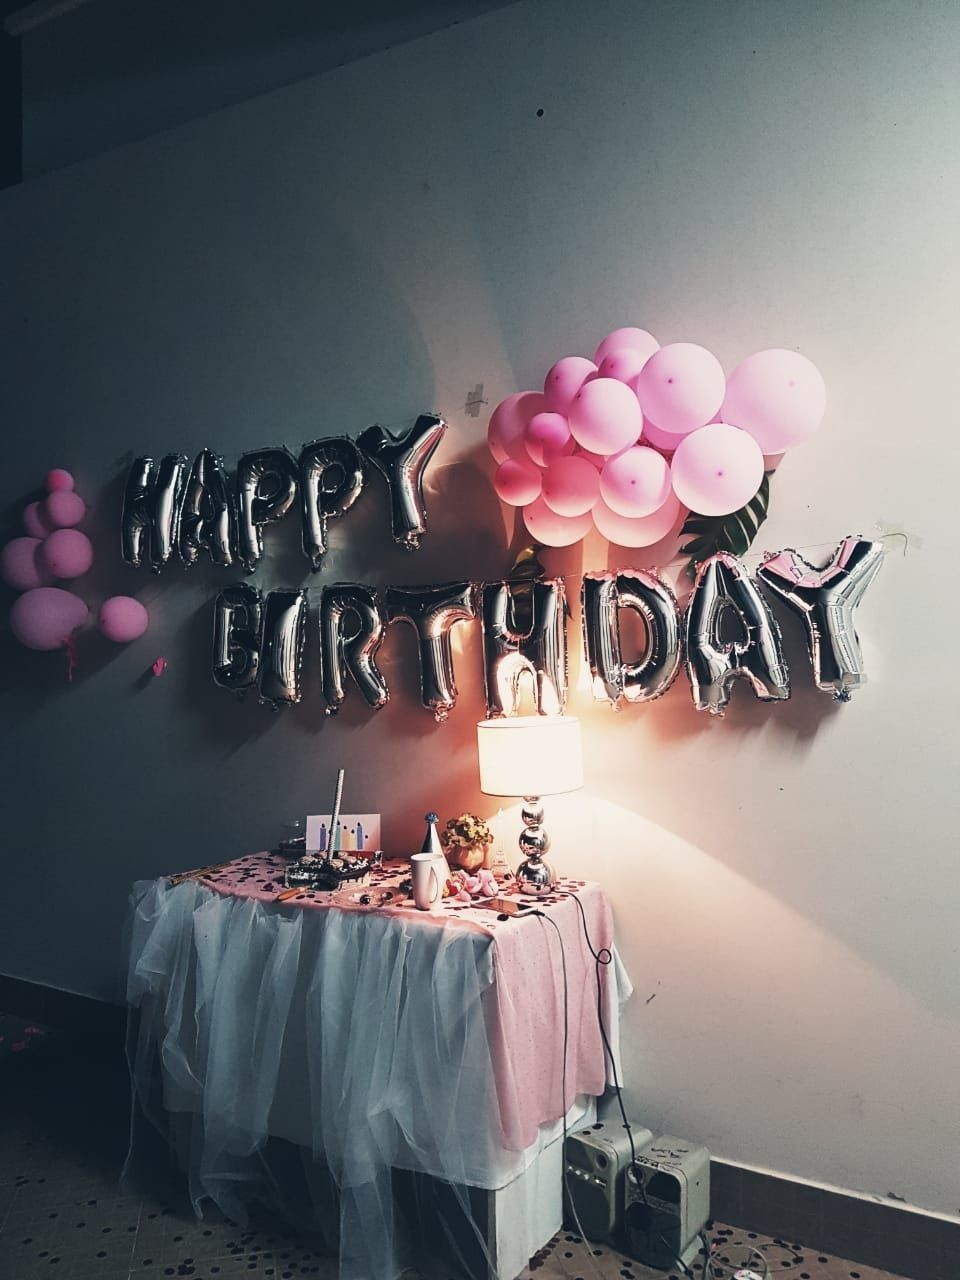 Happy Birthday Birthday Party Decoration Pink Aesthetic Wallpaper Ulang Tahun Ide Dekorasi Ulang Tahun